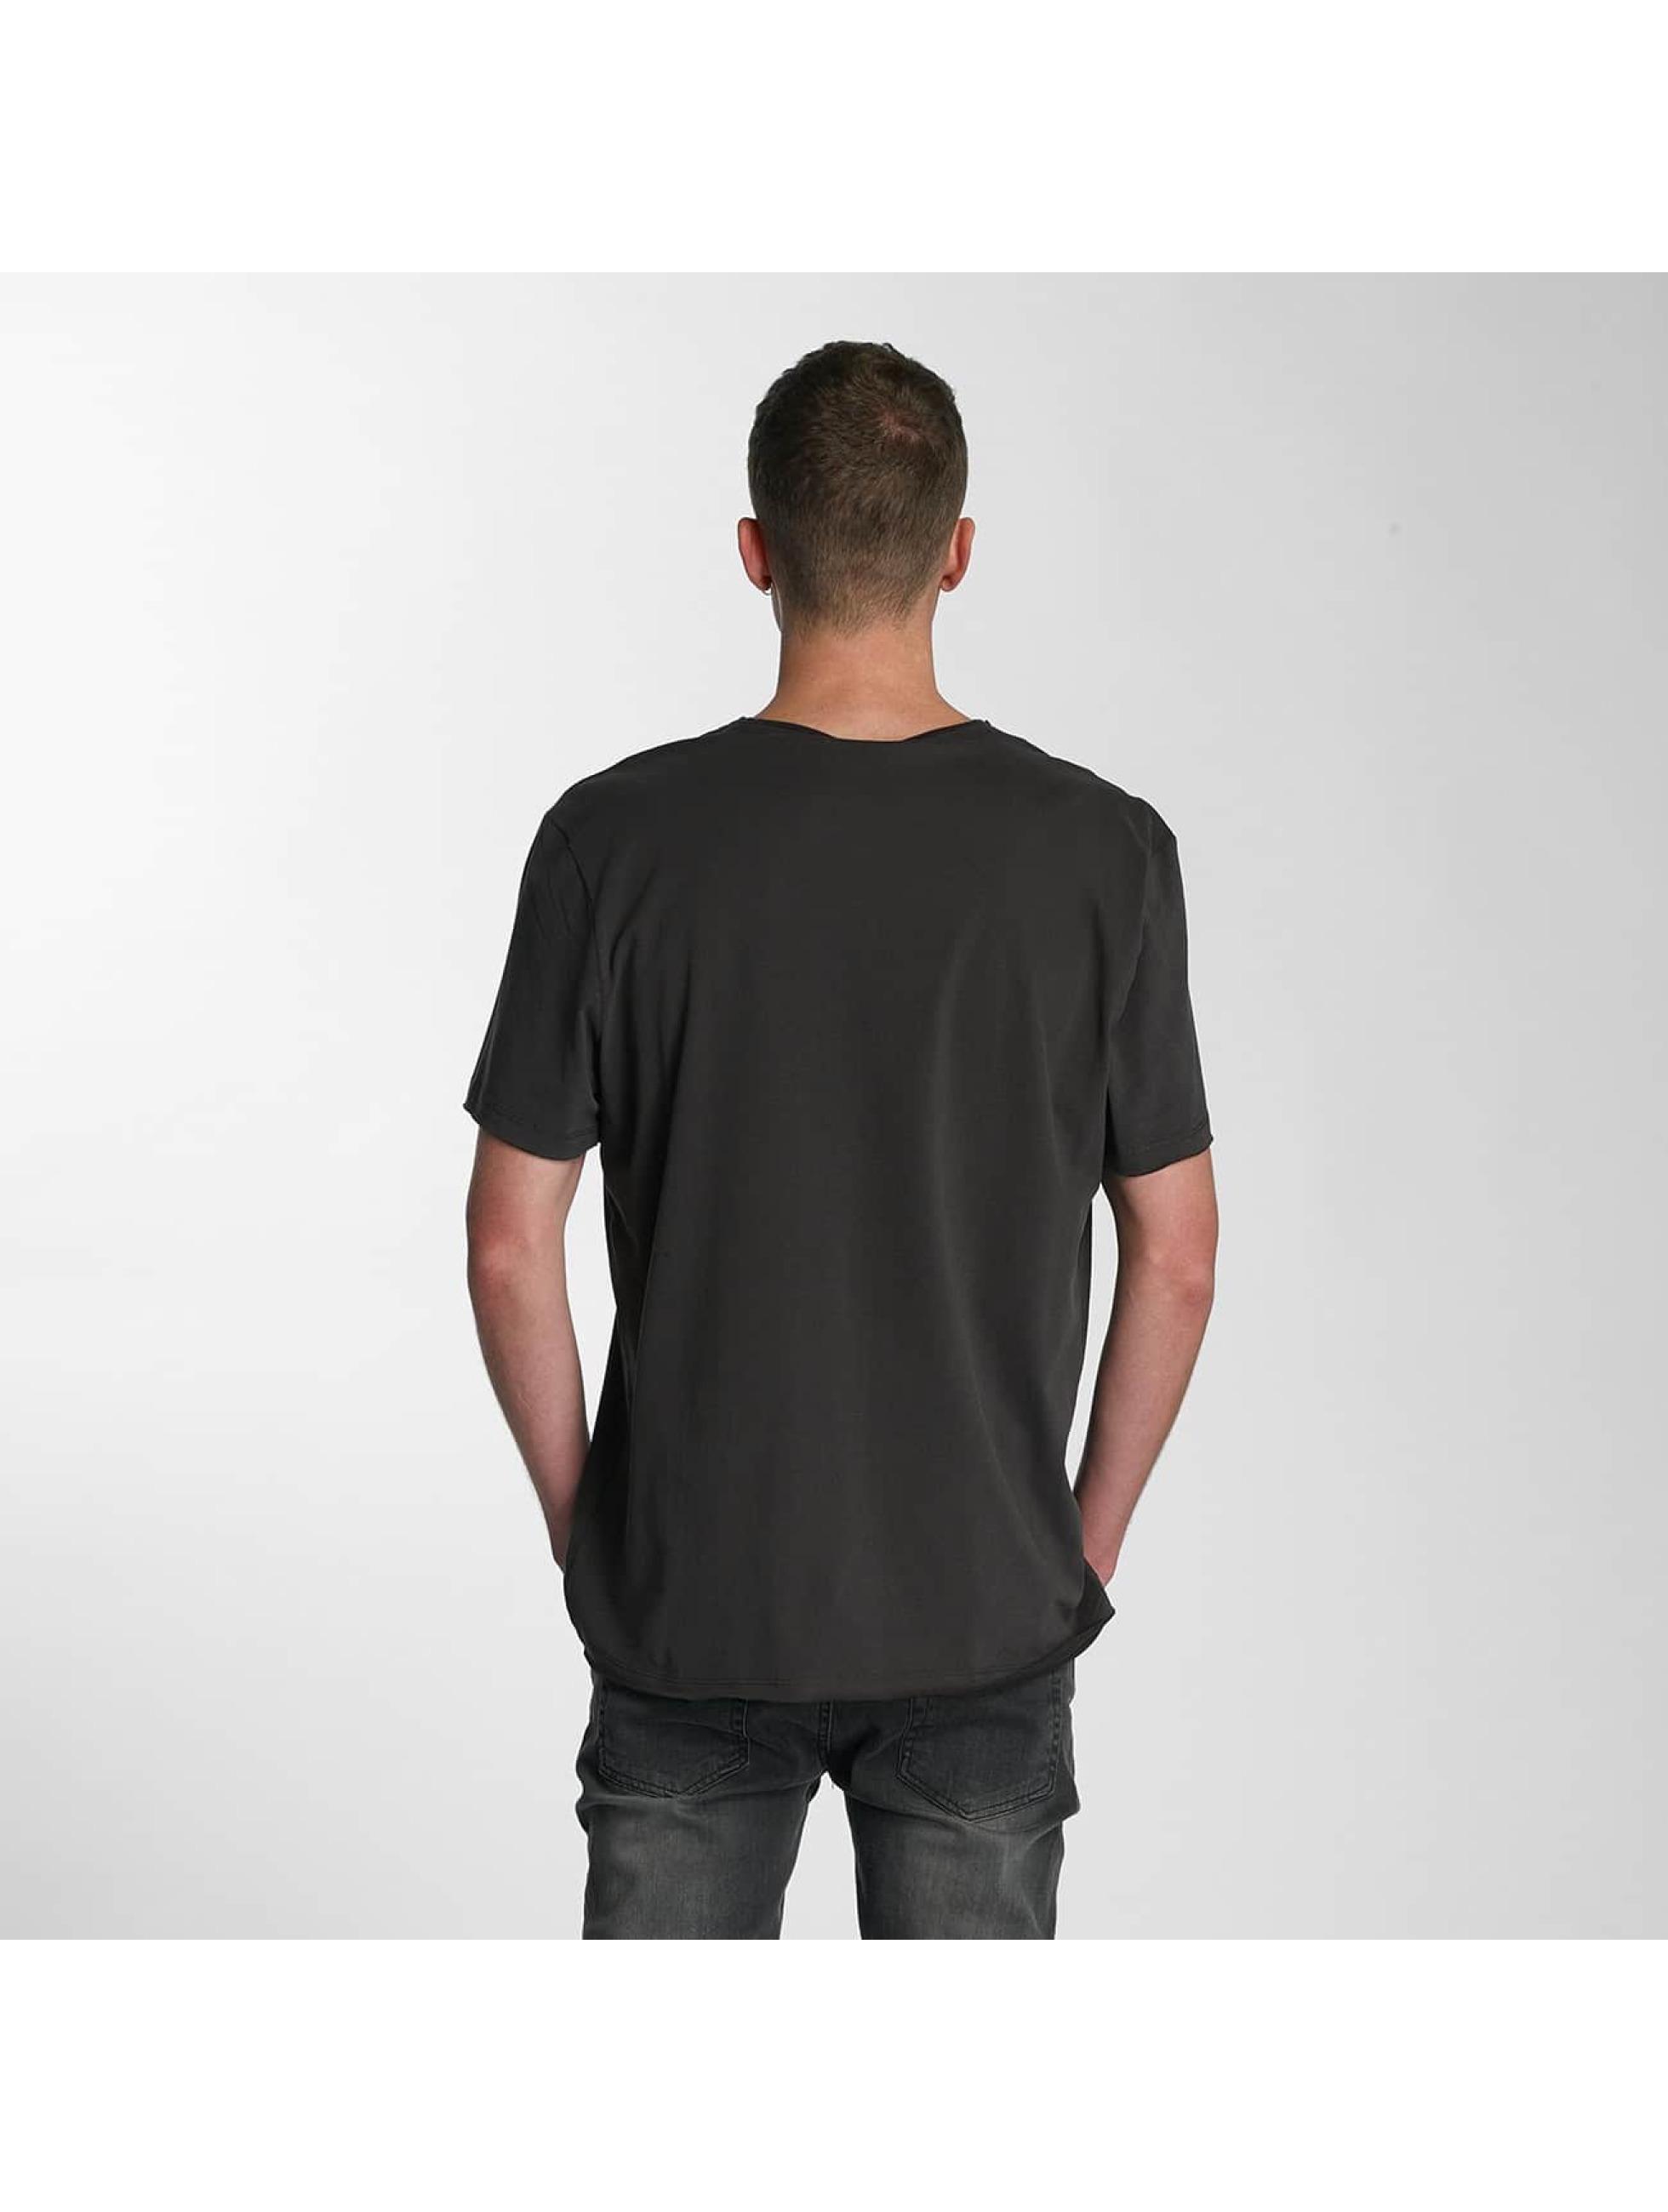 Amplified T-Shirt Guns & Roses LA Paradise City grau